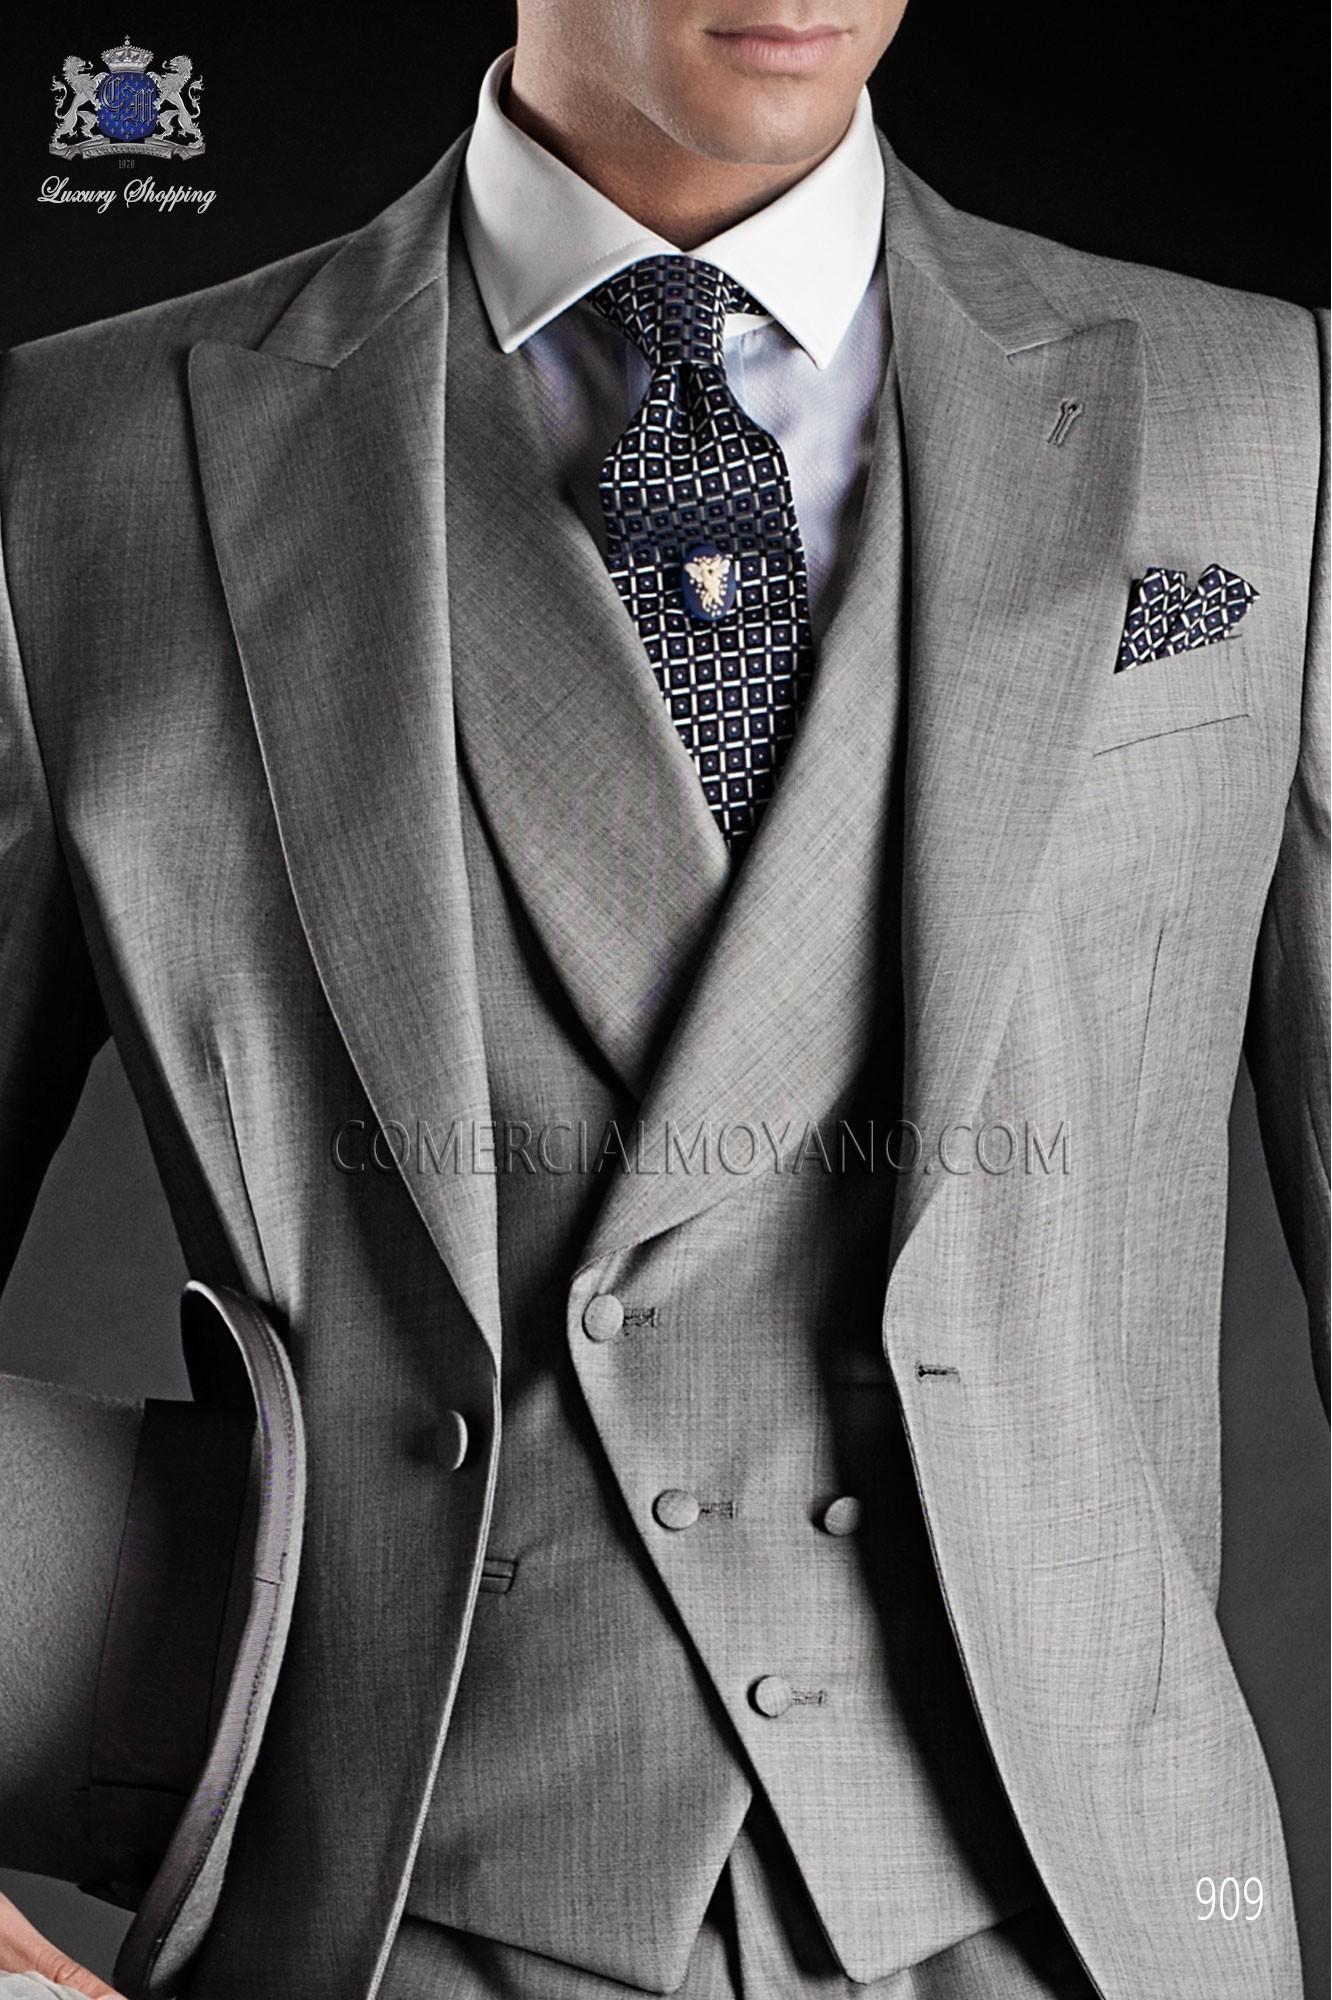 Italian gentleman gray men wedding suit, model: 909 Ottavio Nuccio Gala Gentleman Collection